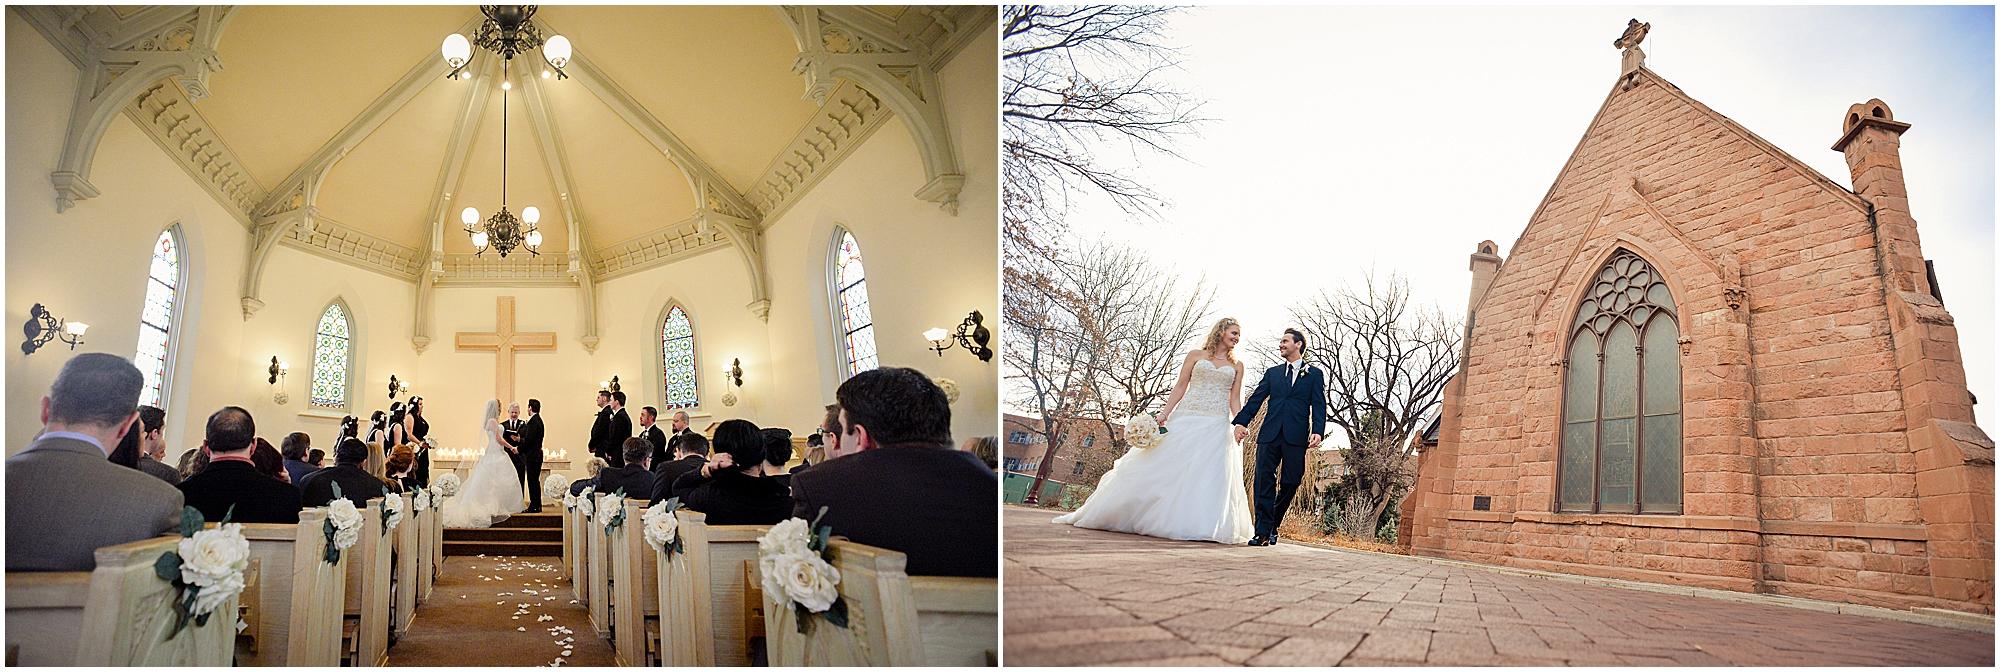 Evans Memorial Chapel Wedding Photos